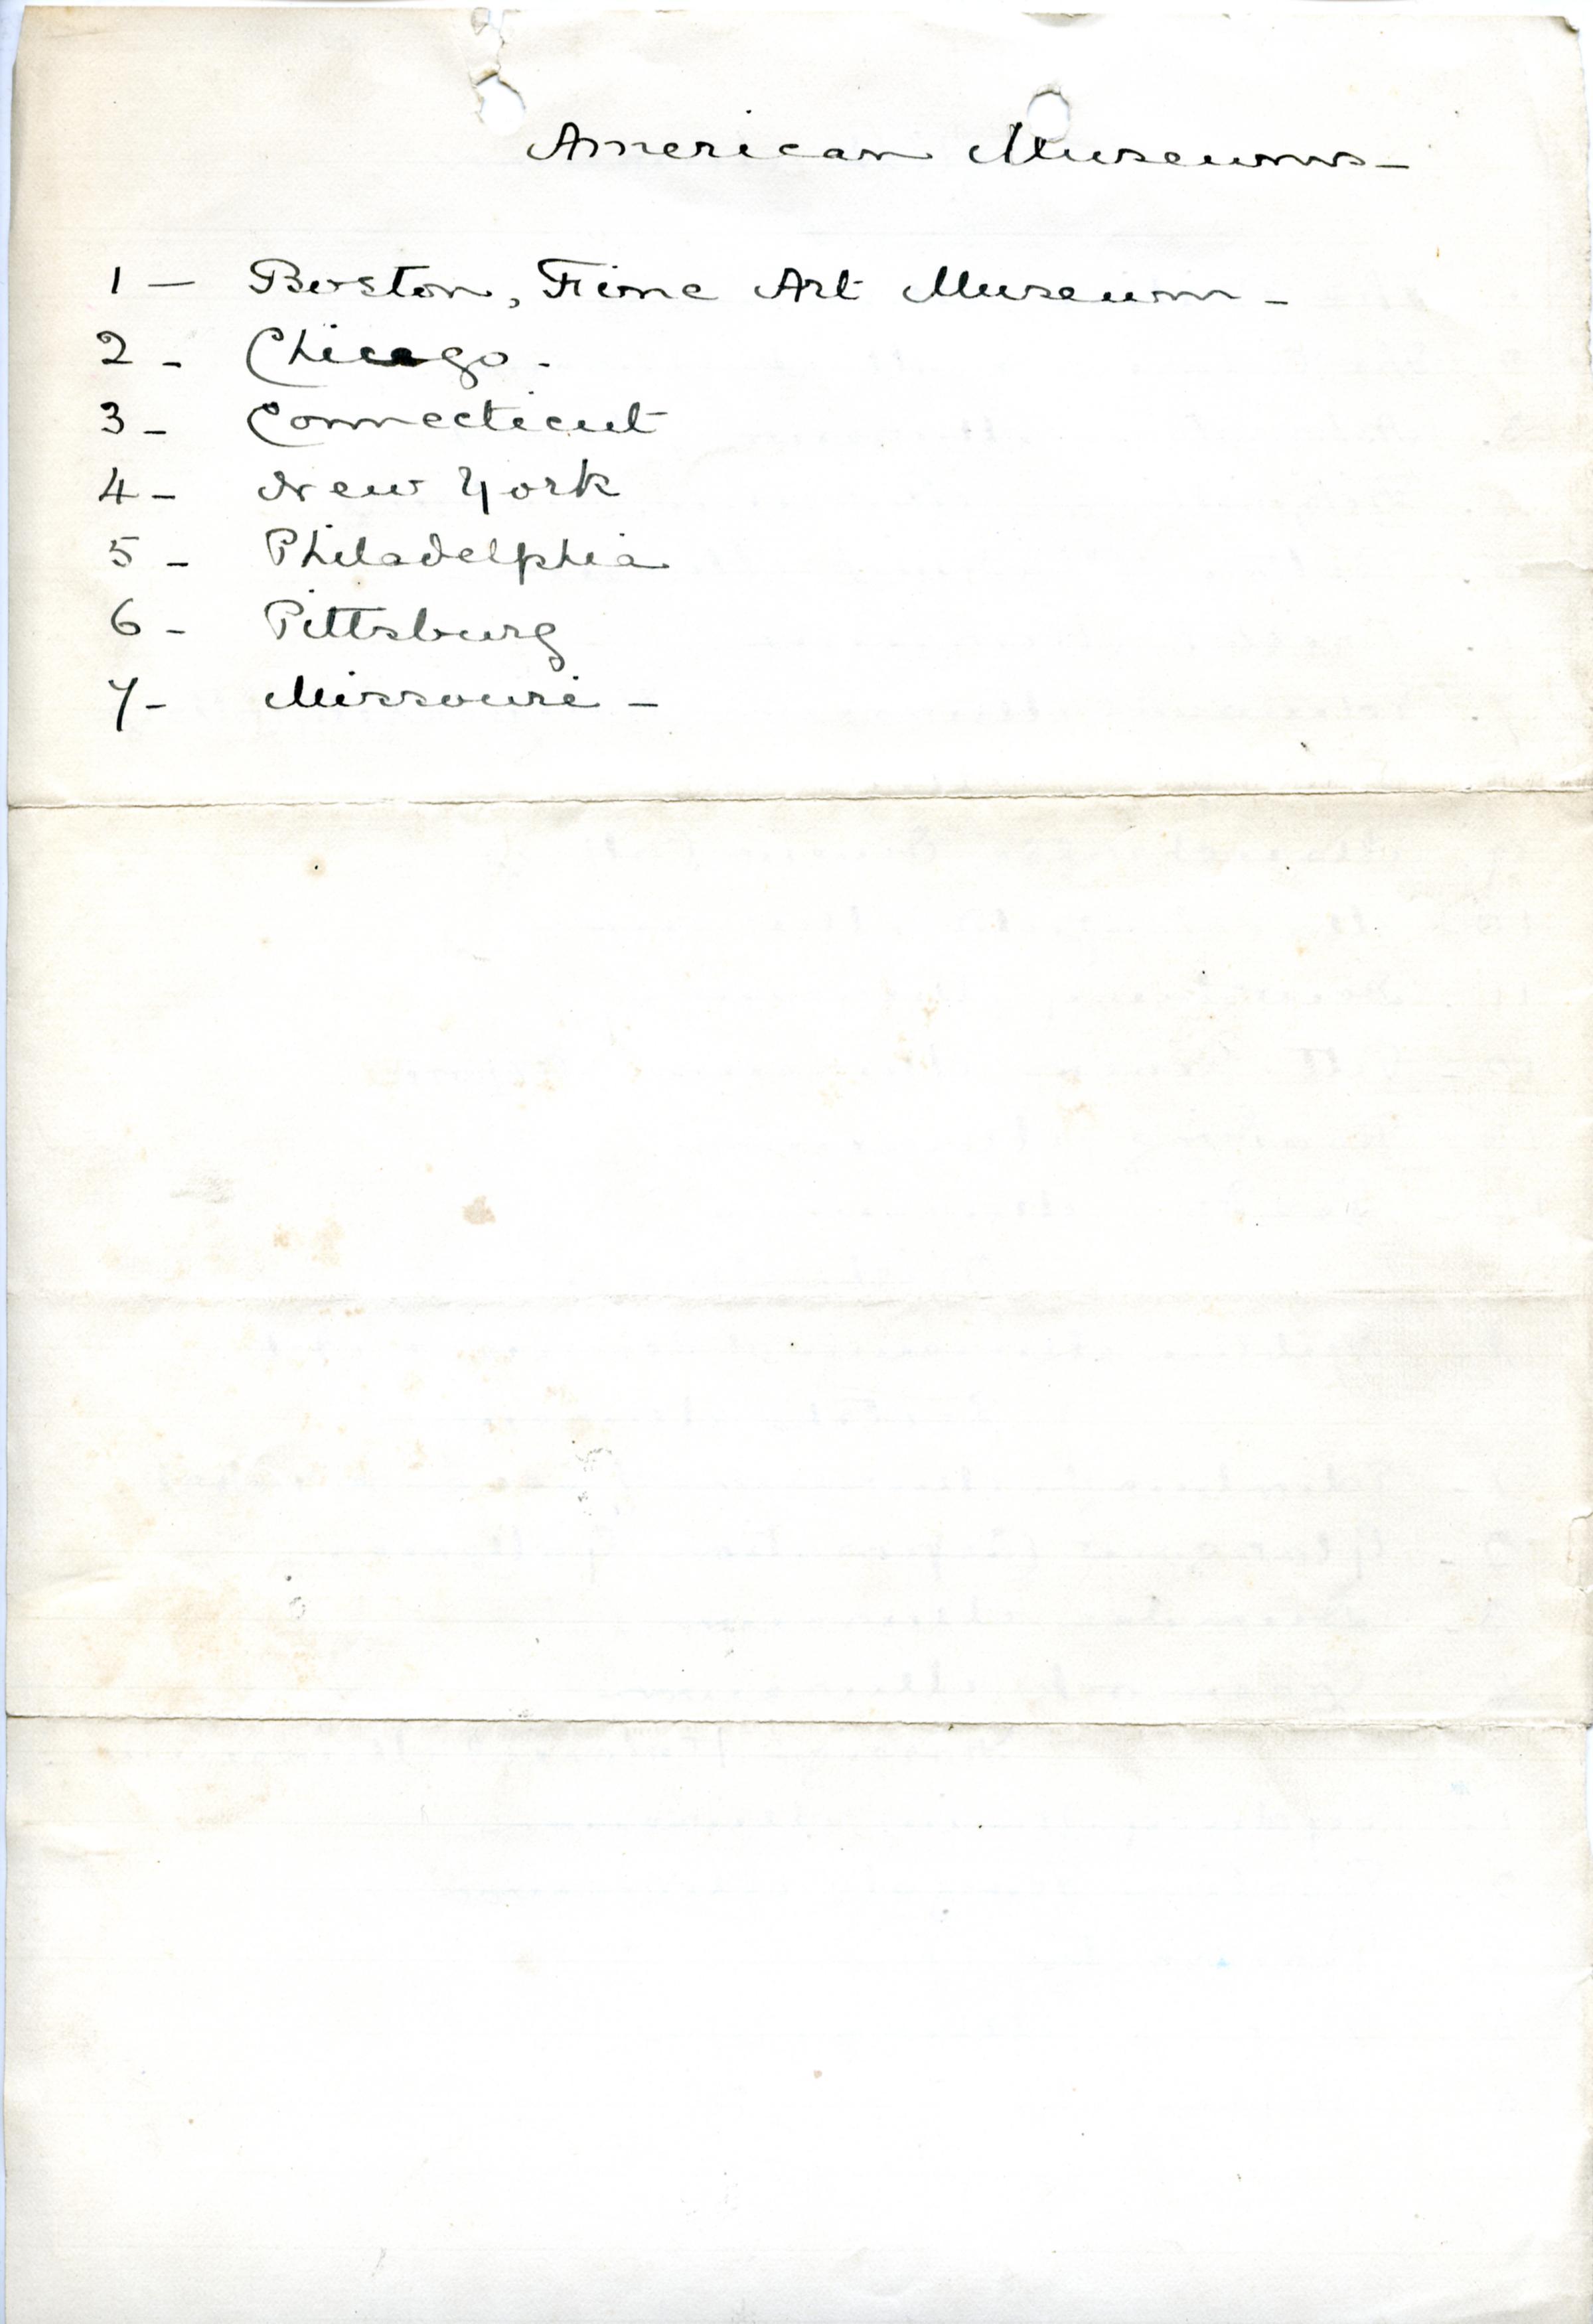 1898-1899 Hu, 1899-1900 Abydos DIST.17.87b